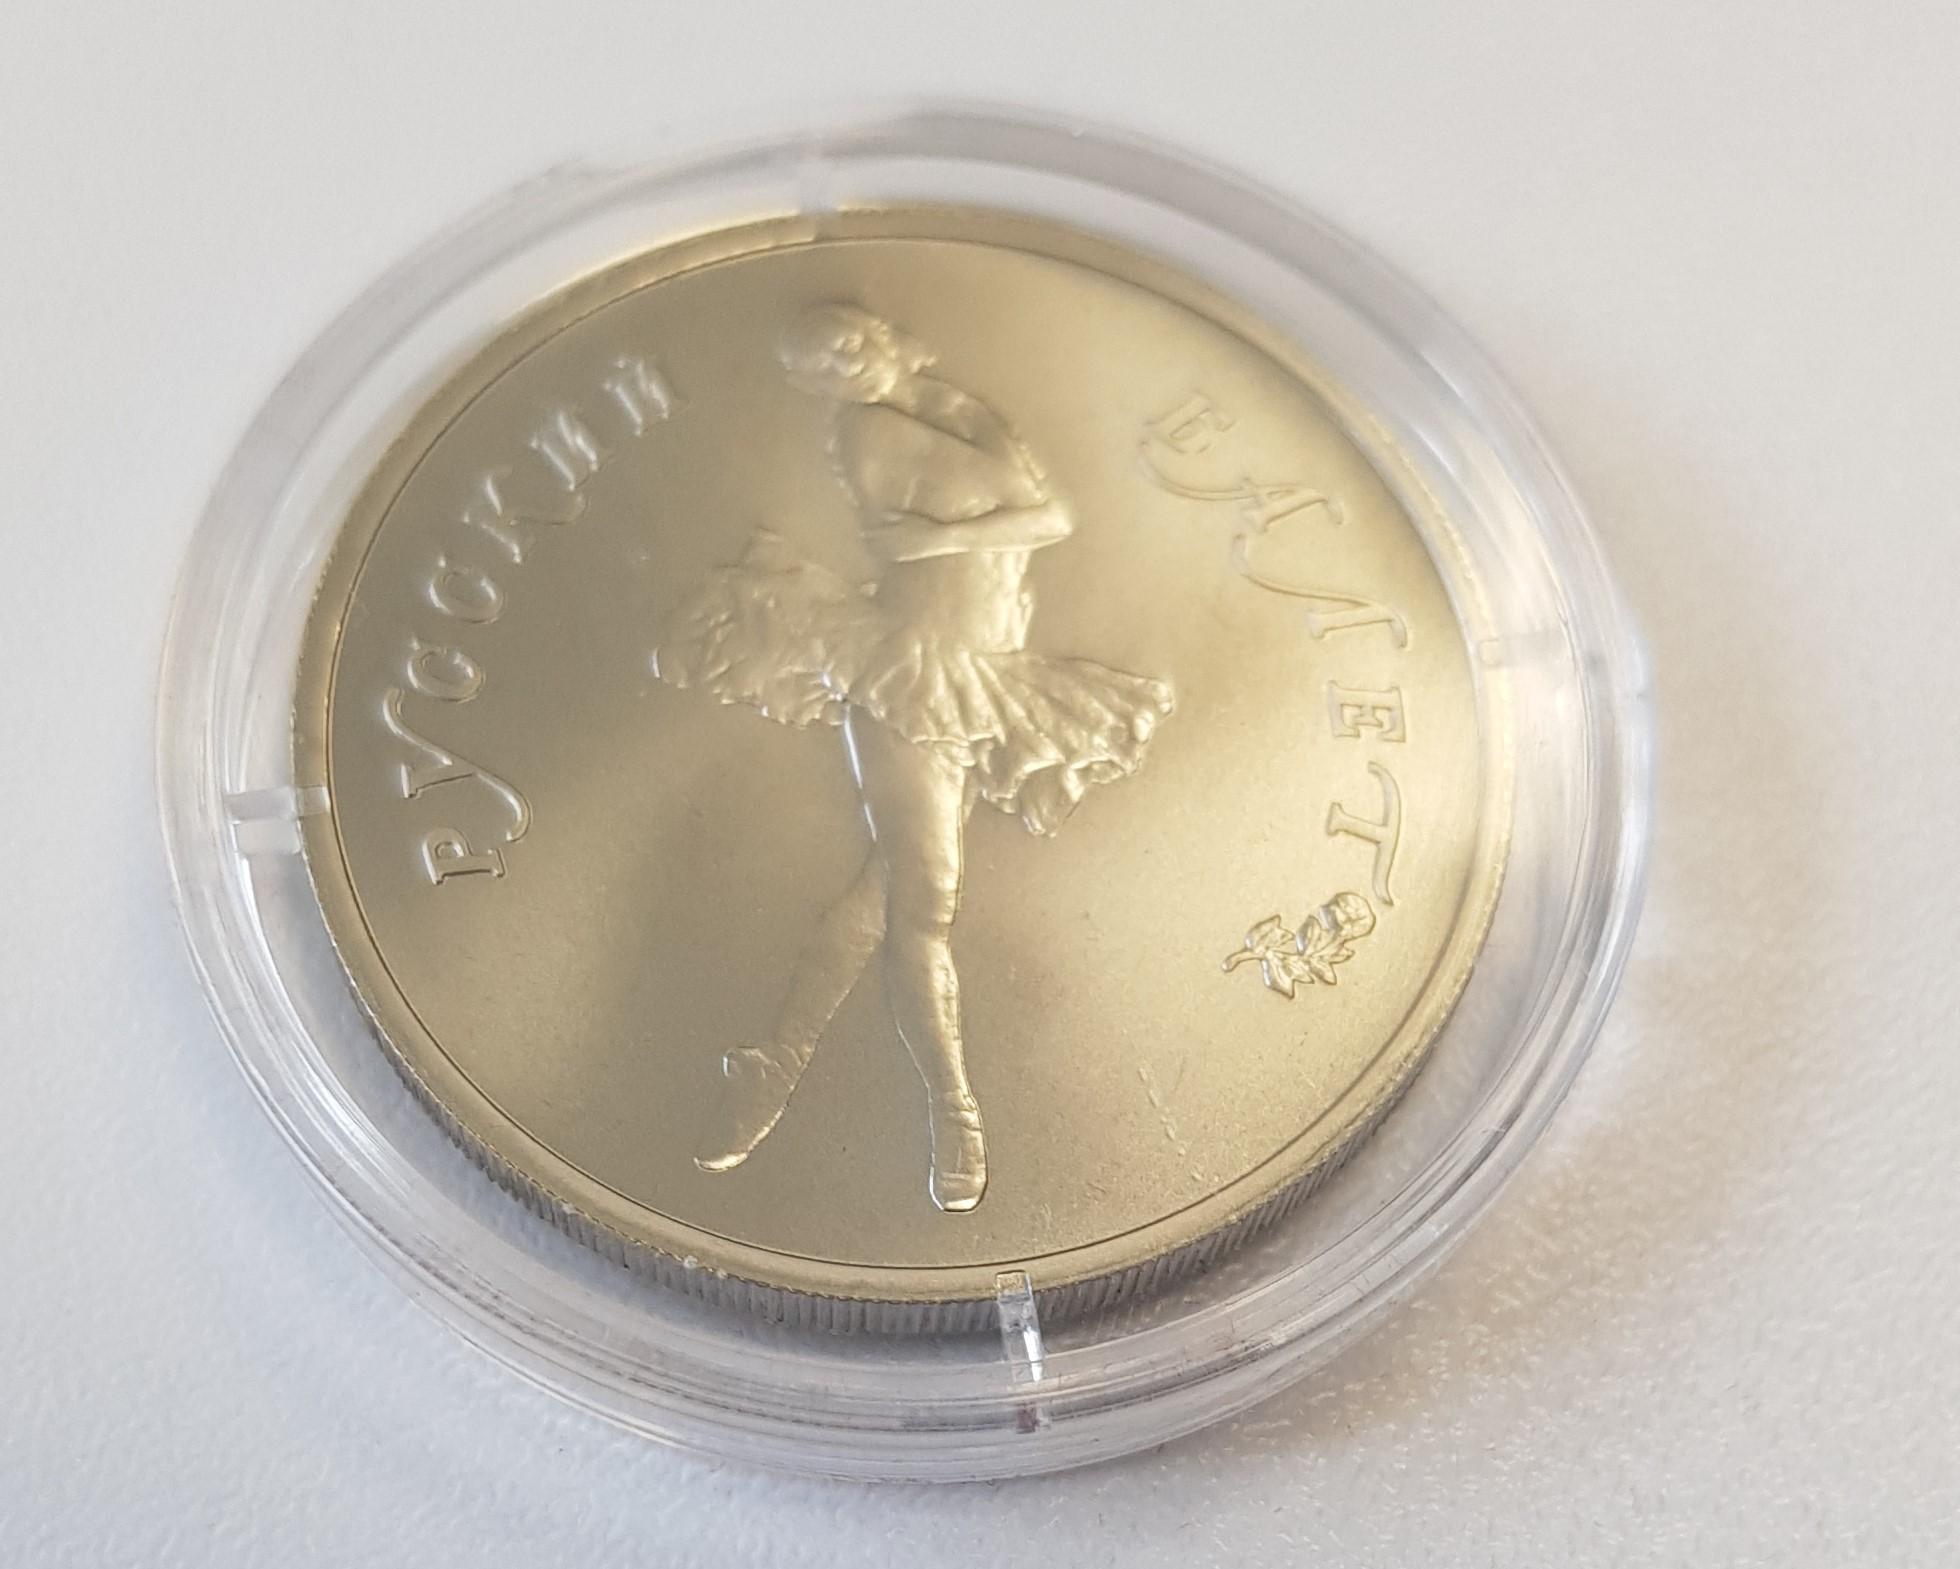 1 Unze (oz) 10 Rubel Palladiummünzen